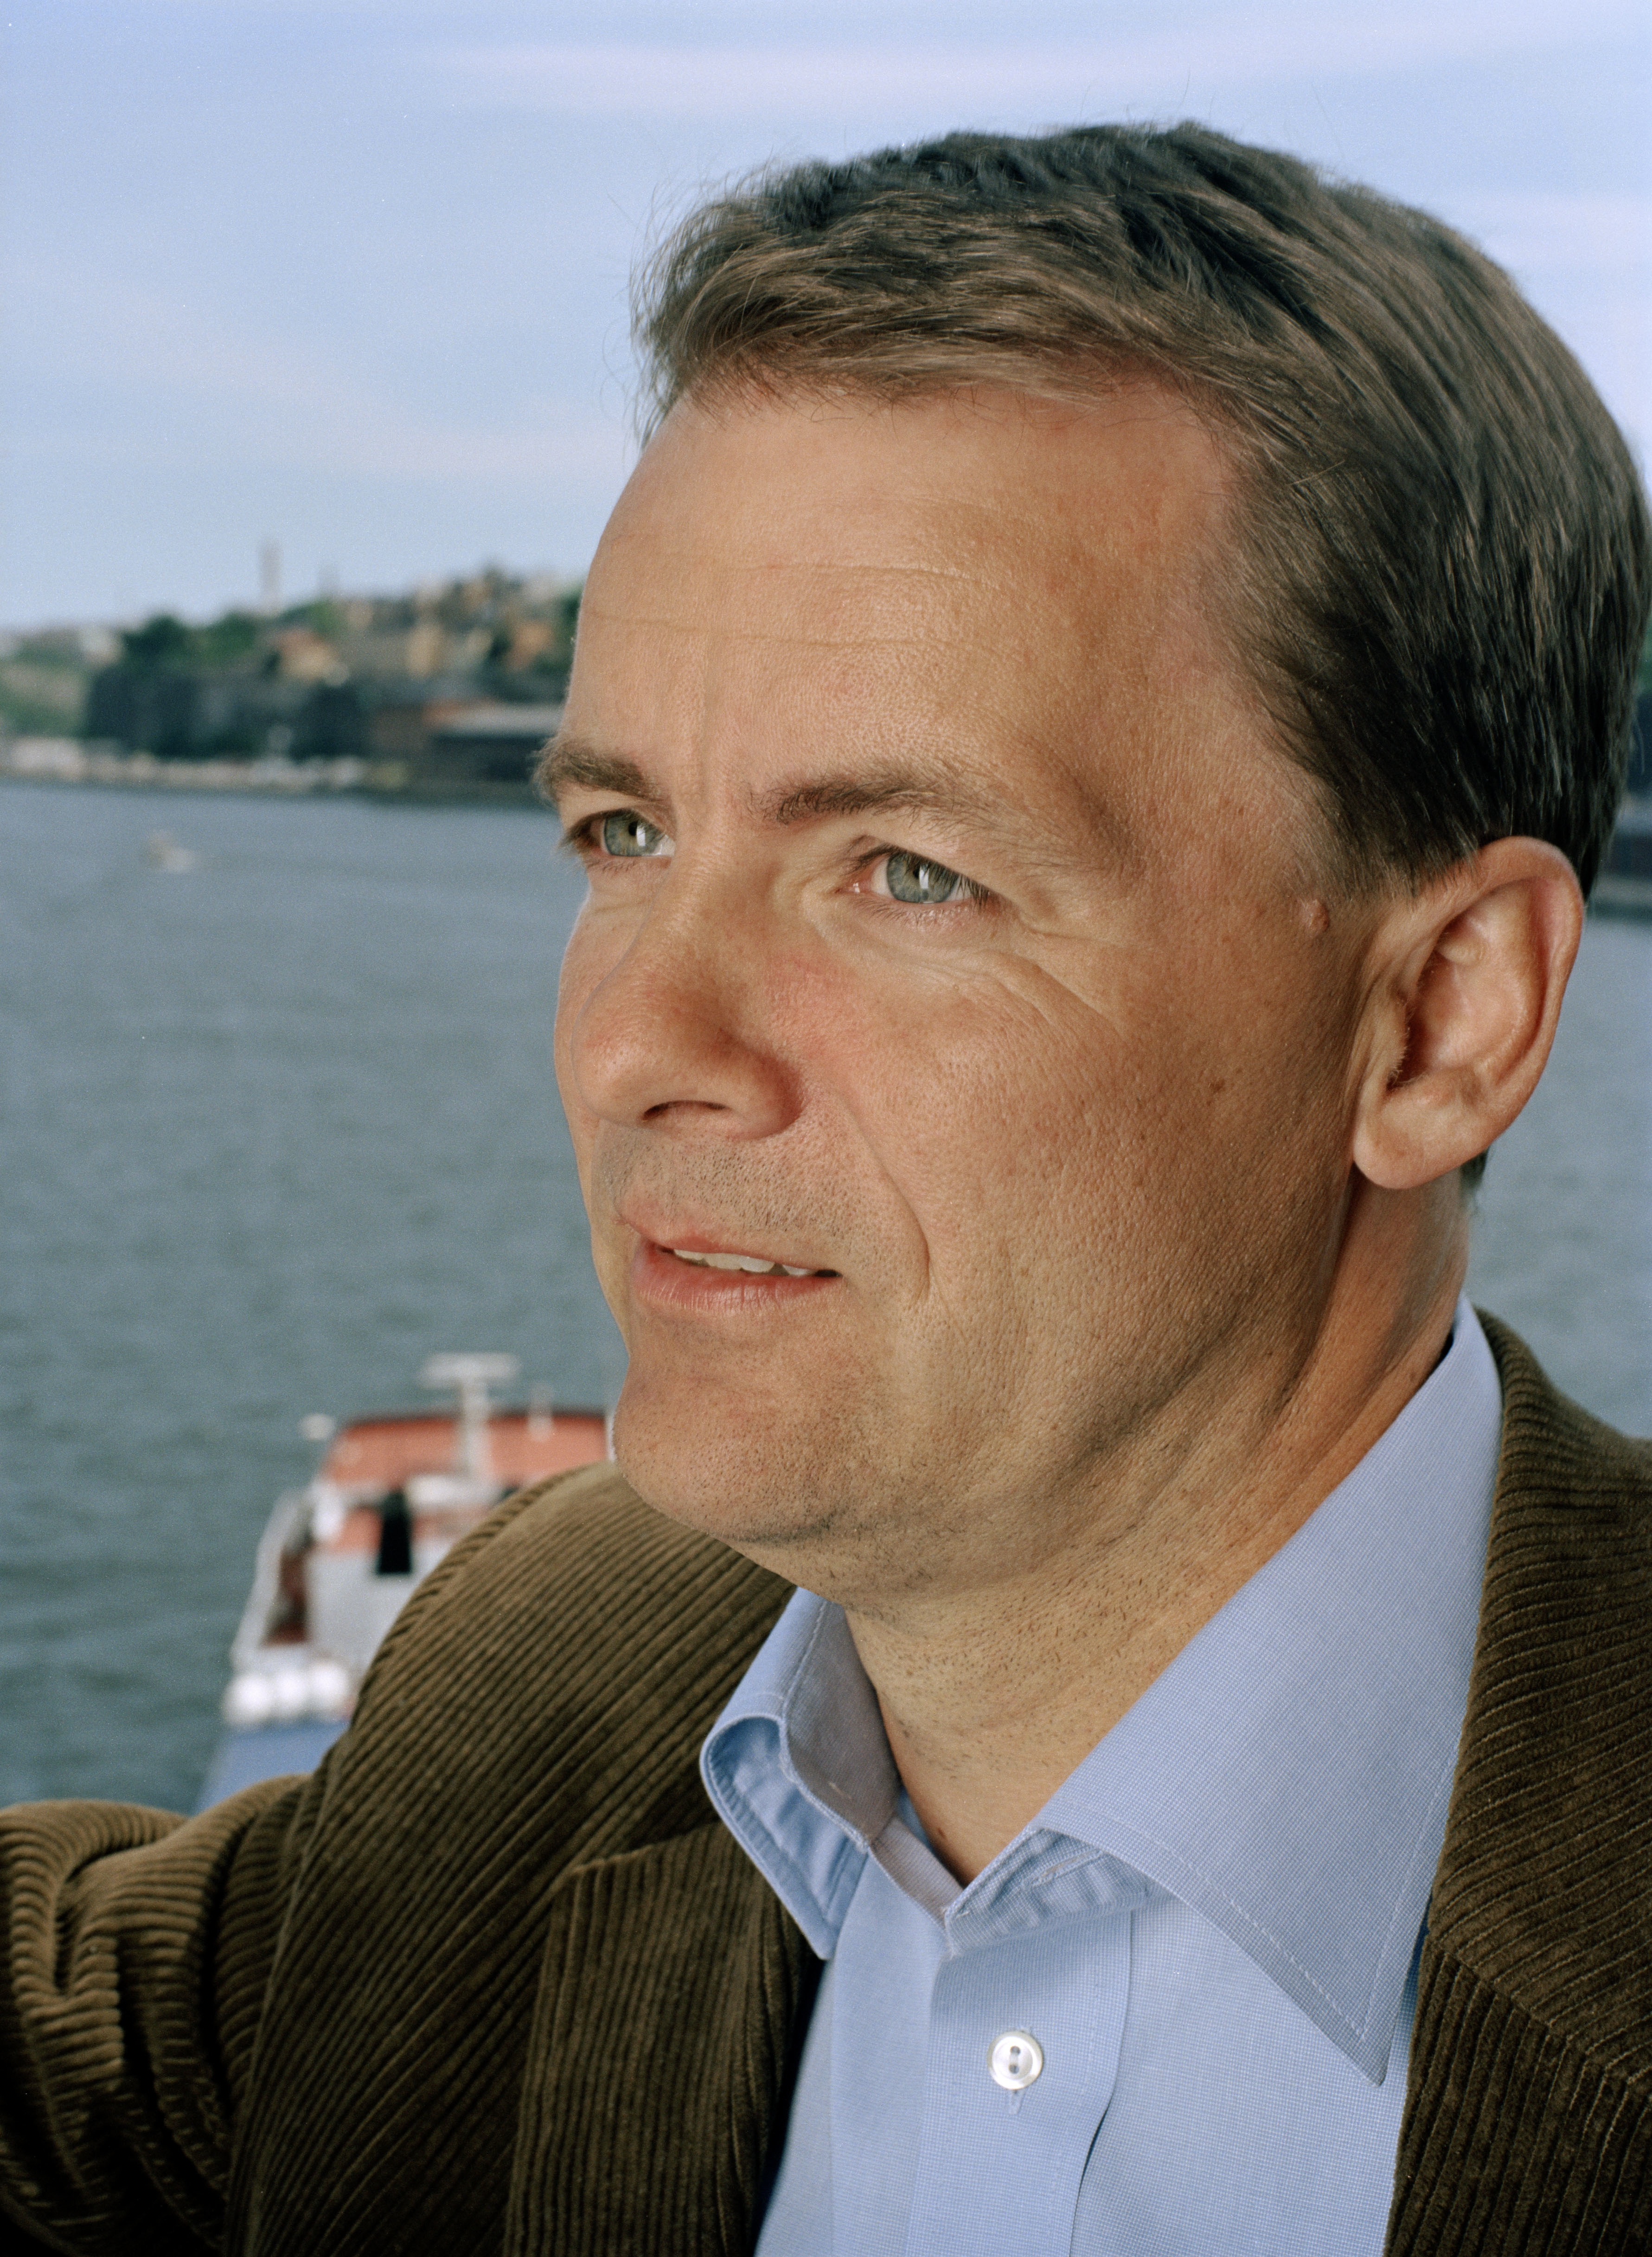 Magnus Melander, founder and CEO, Wbird